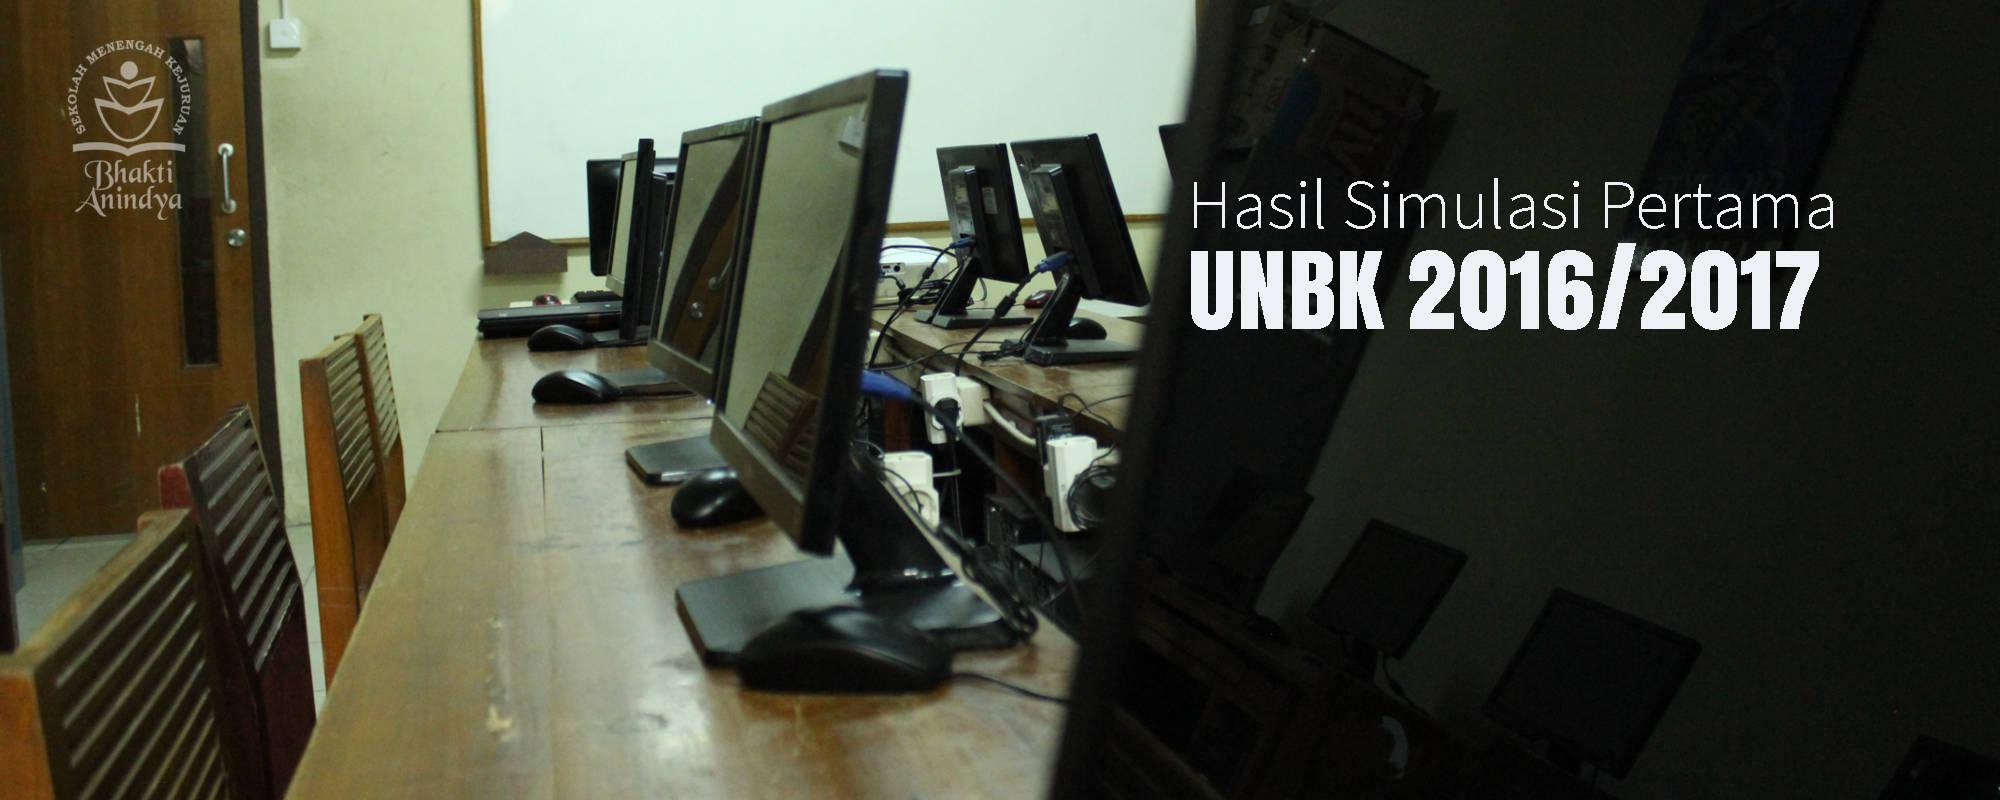 Hasil Simulasi Pertama UNBK (Ujian Nasional Berbasis Komputer) 2016/2017 SMK Bhakti Anindya Tangerang